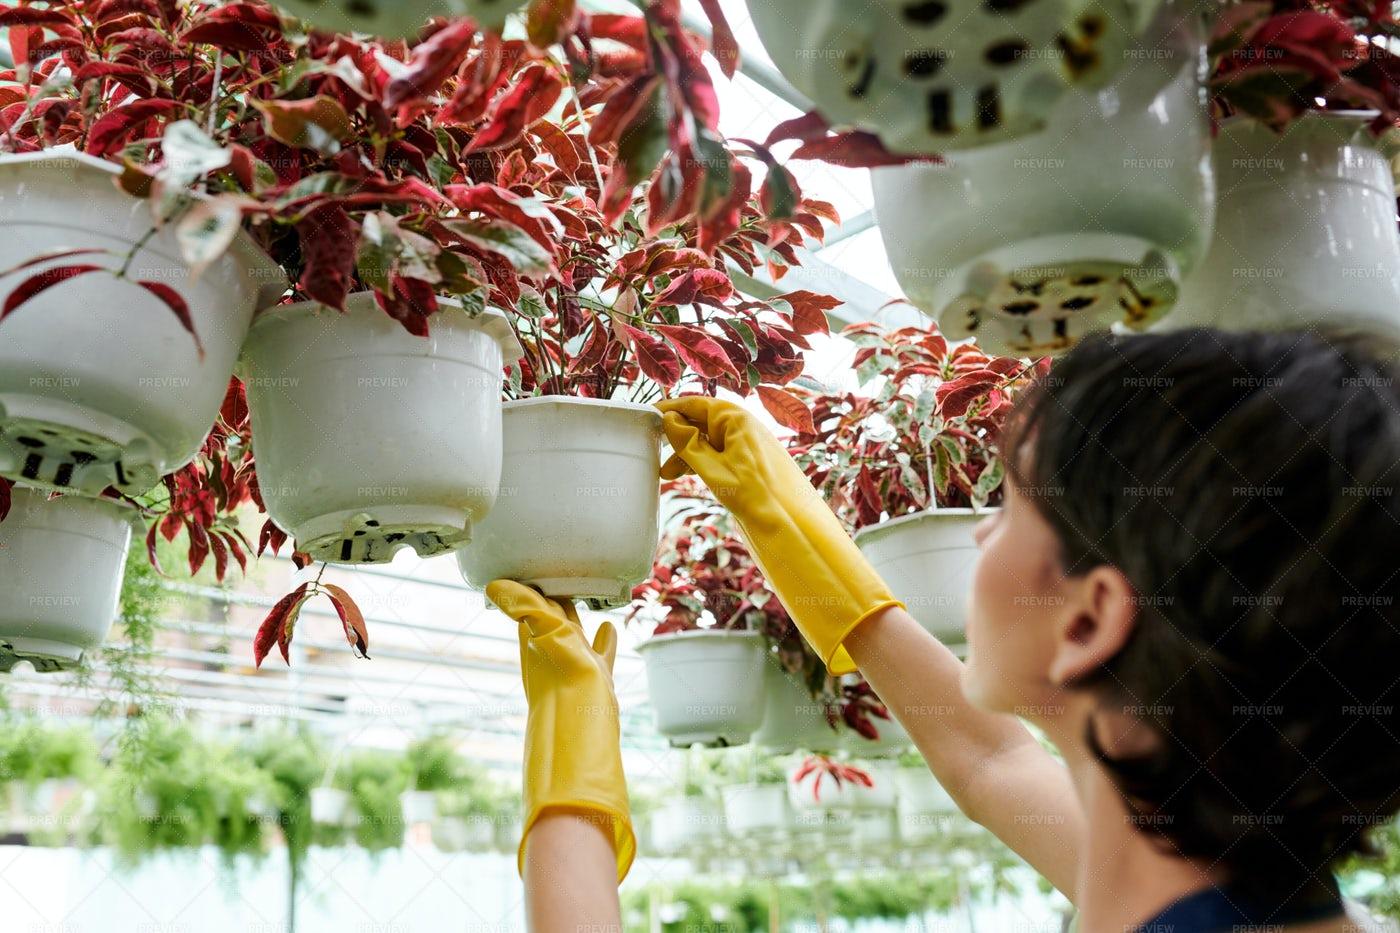 Plant Nursery Worker Checking Flowers: Stock Photos